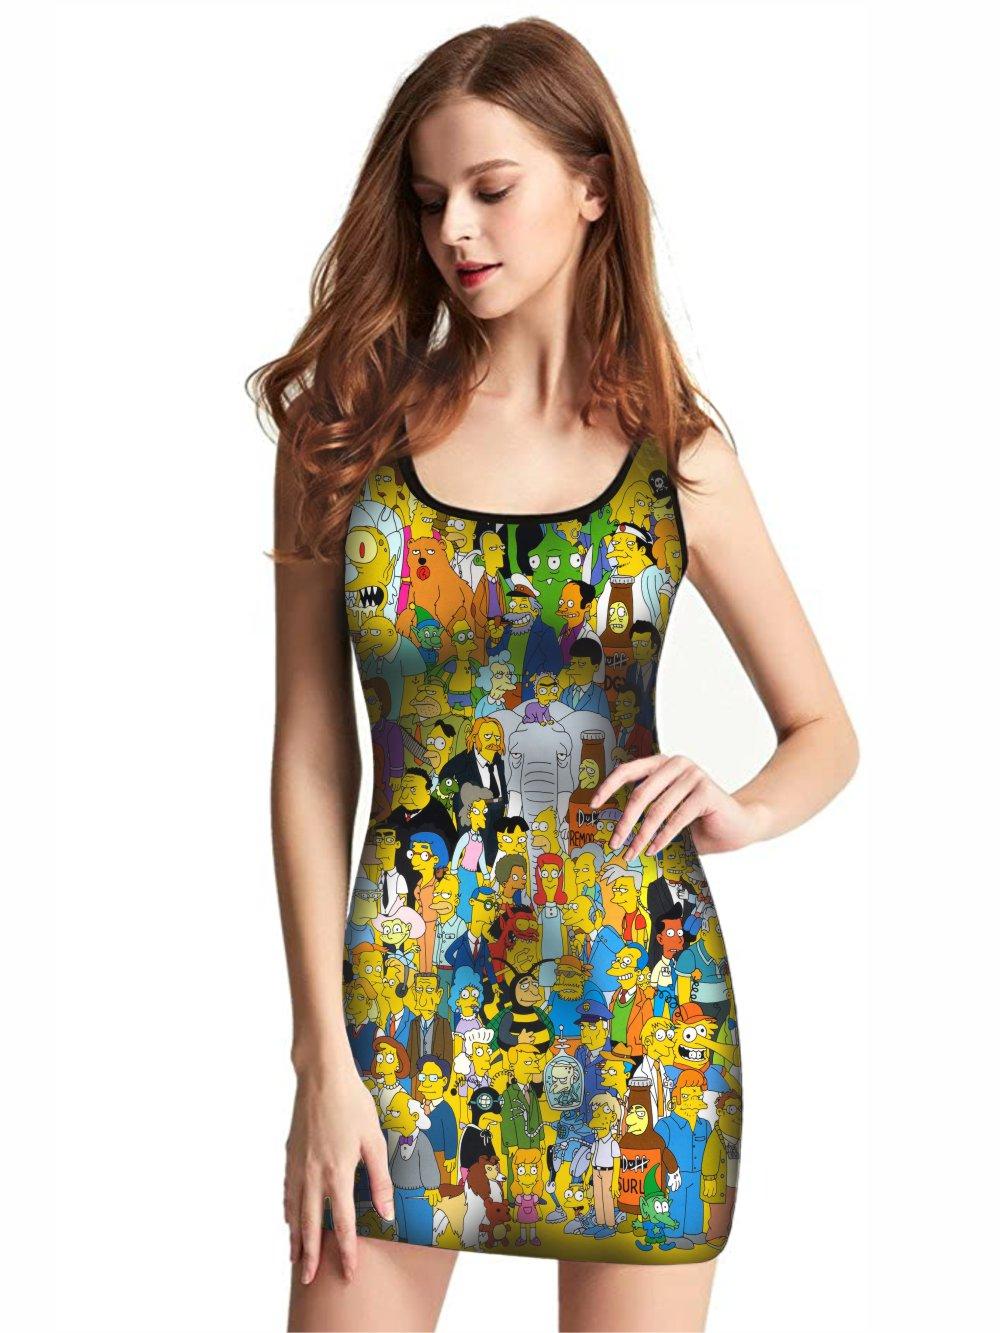 Vestido Feminino Full Printed The Simpsons FP_023